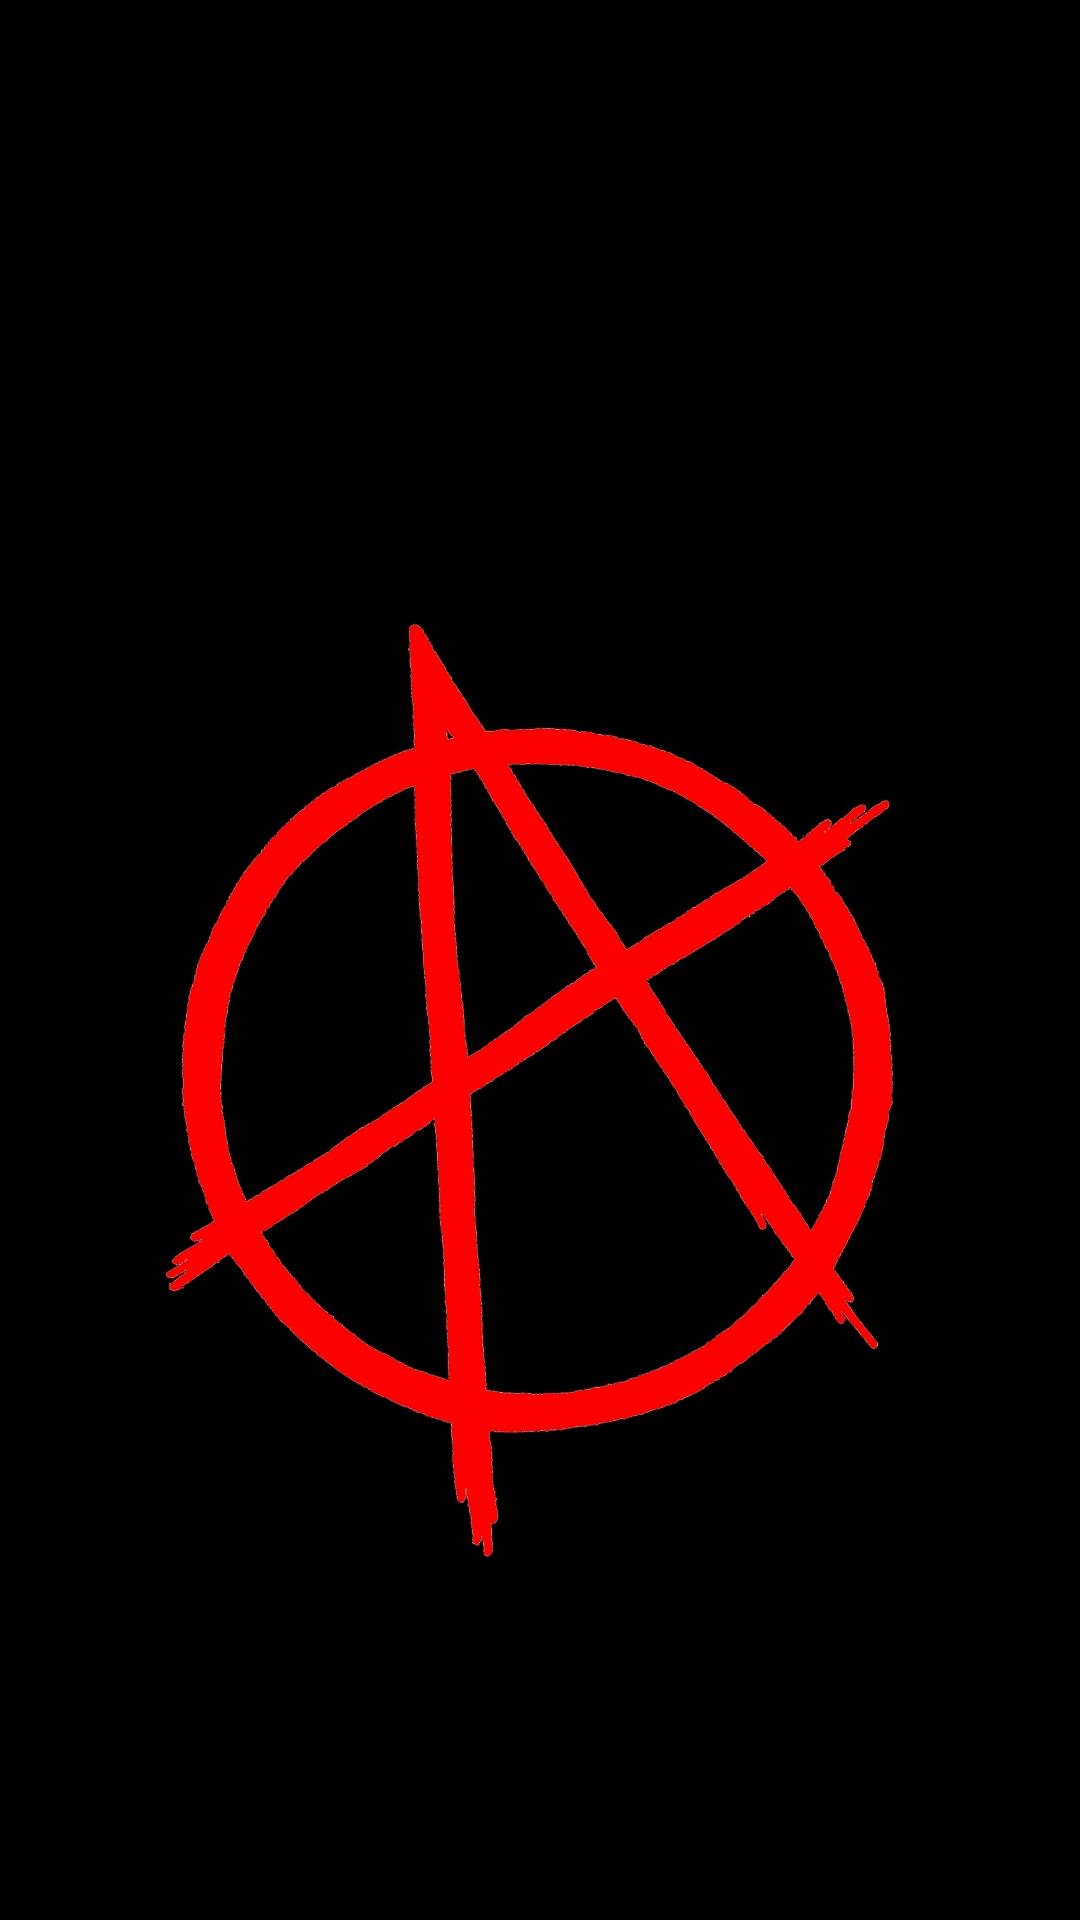 Dark Anarchy Wallpapers Iphone Wallpaper